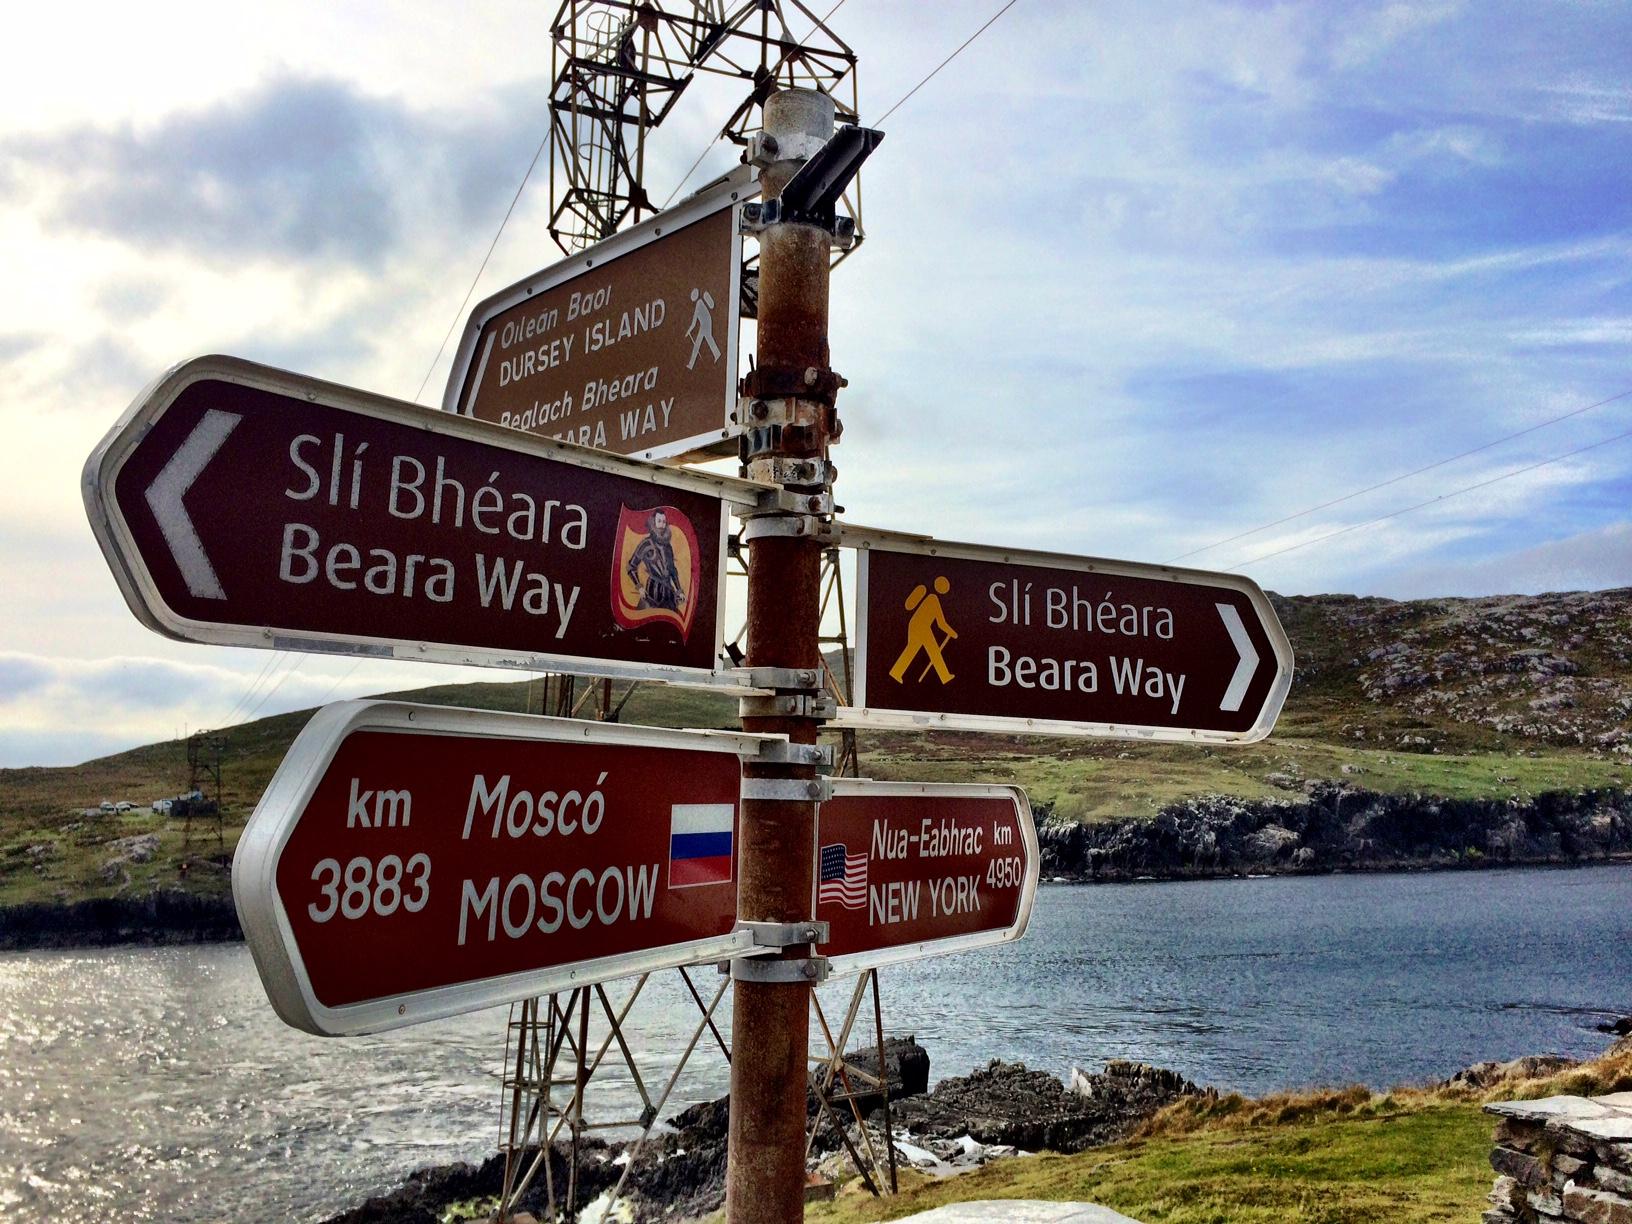 Castletownbere, Dursey Island, Garinish Point and Allihies